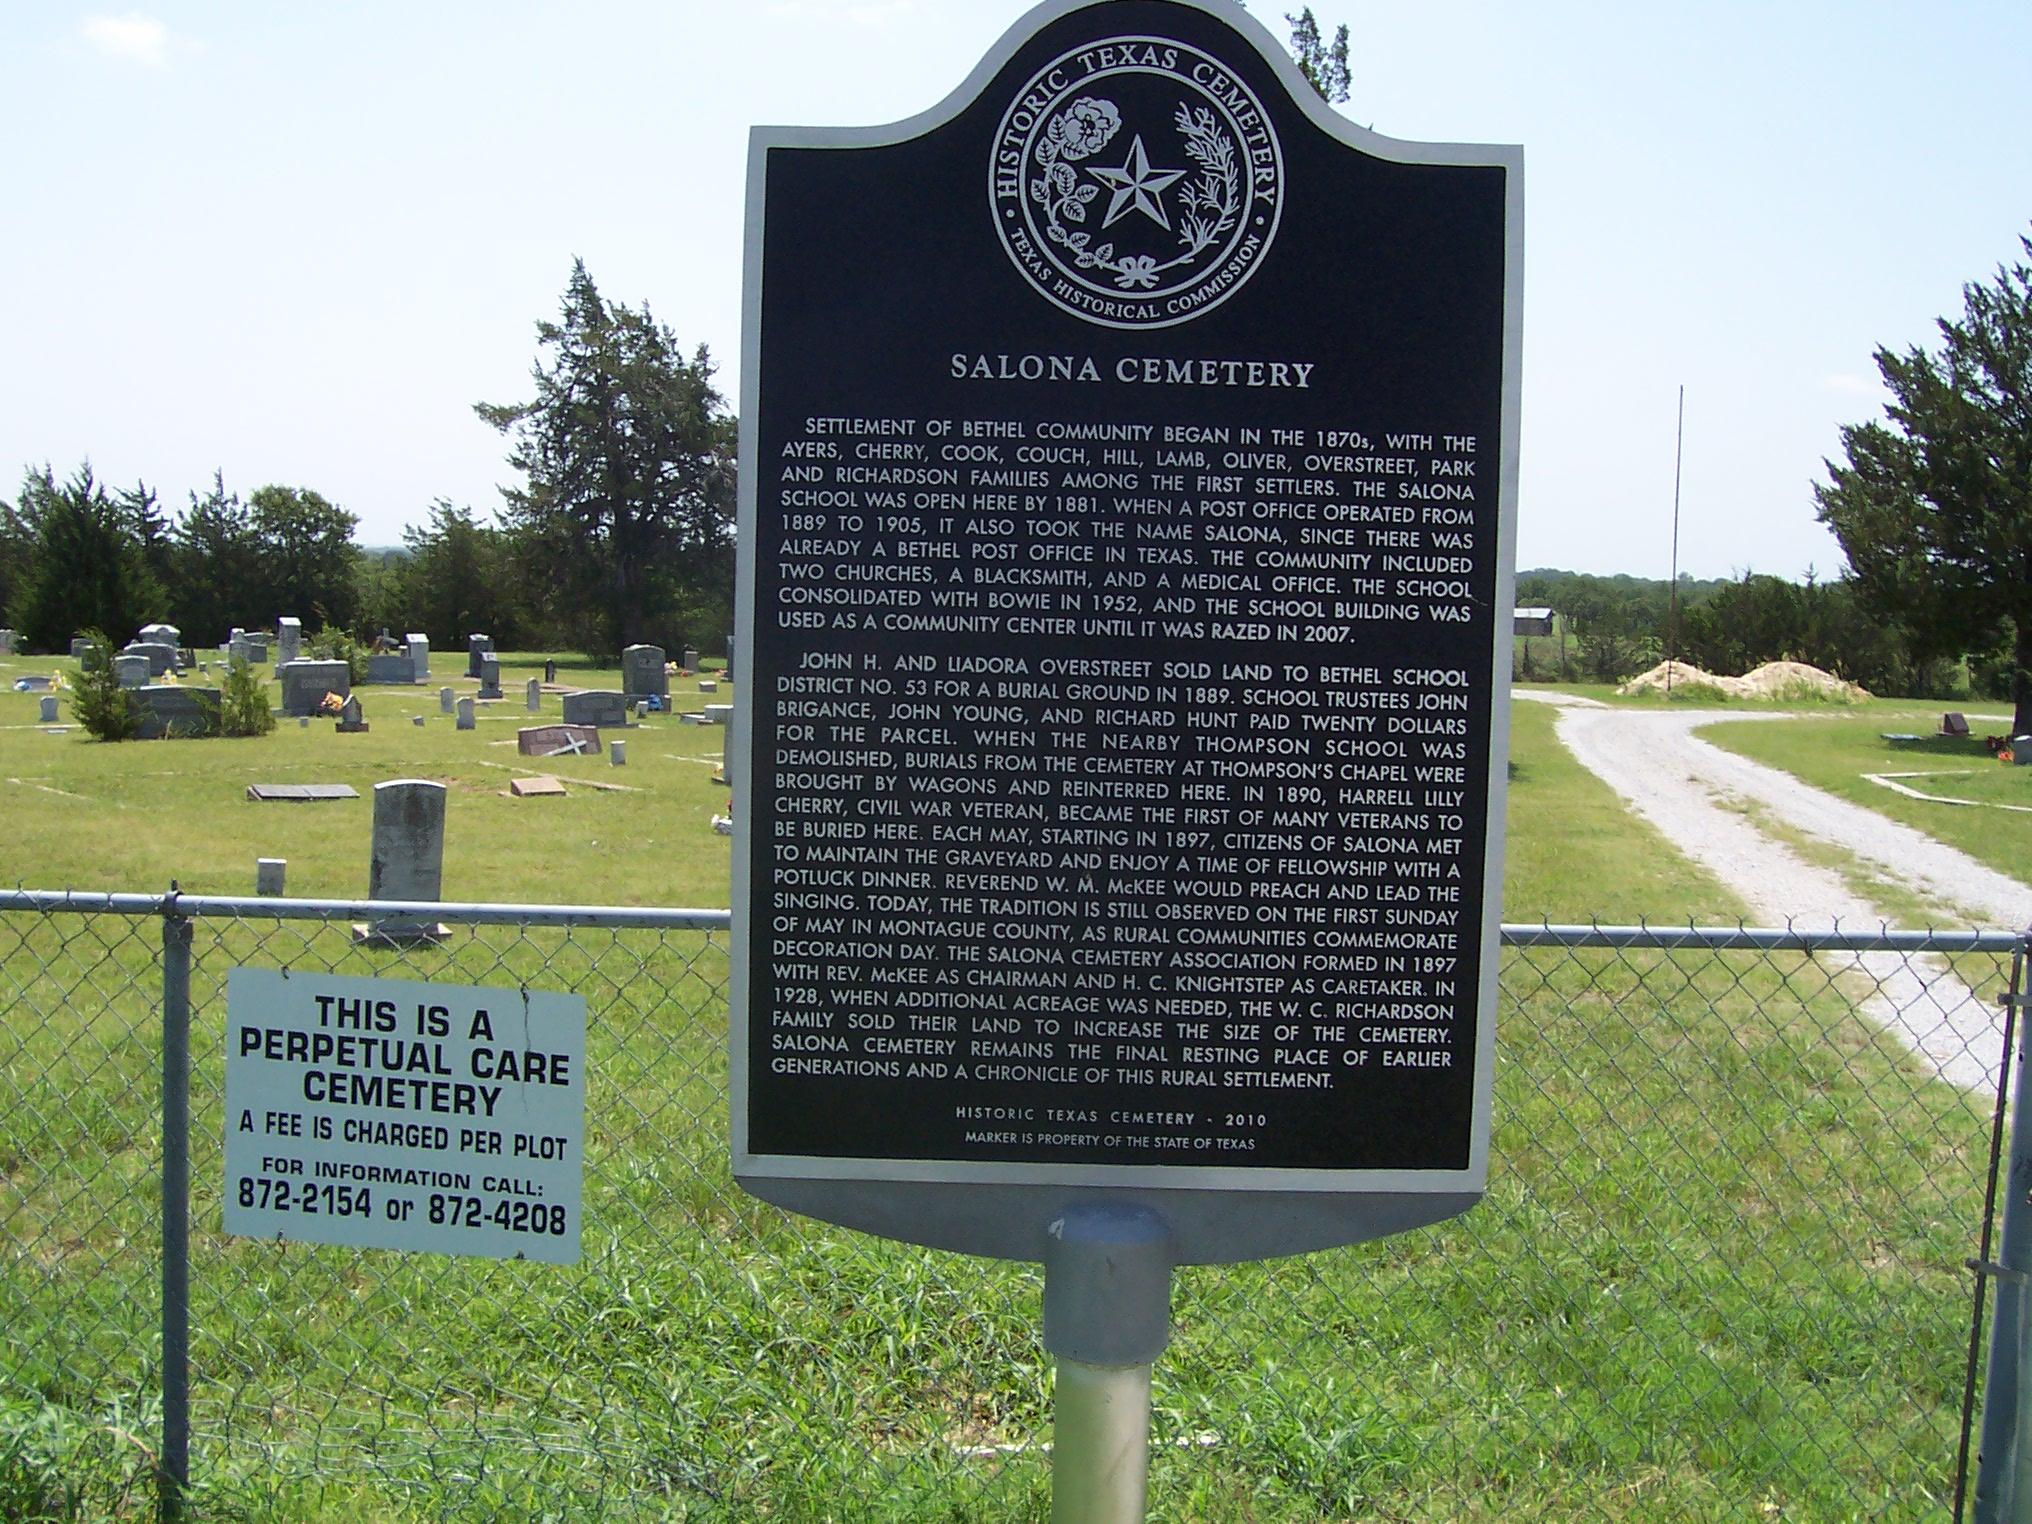 Salona Cemetery